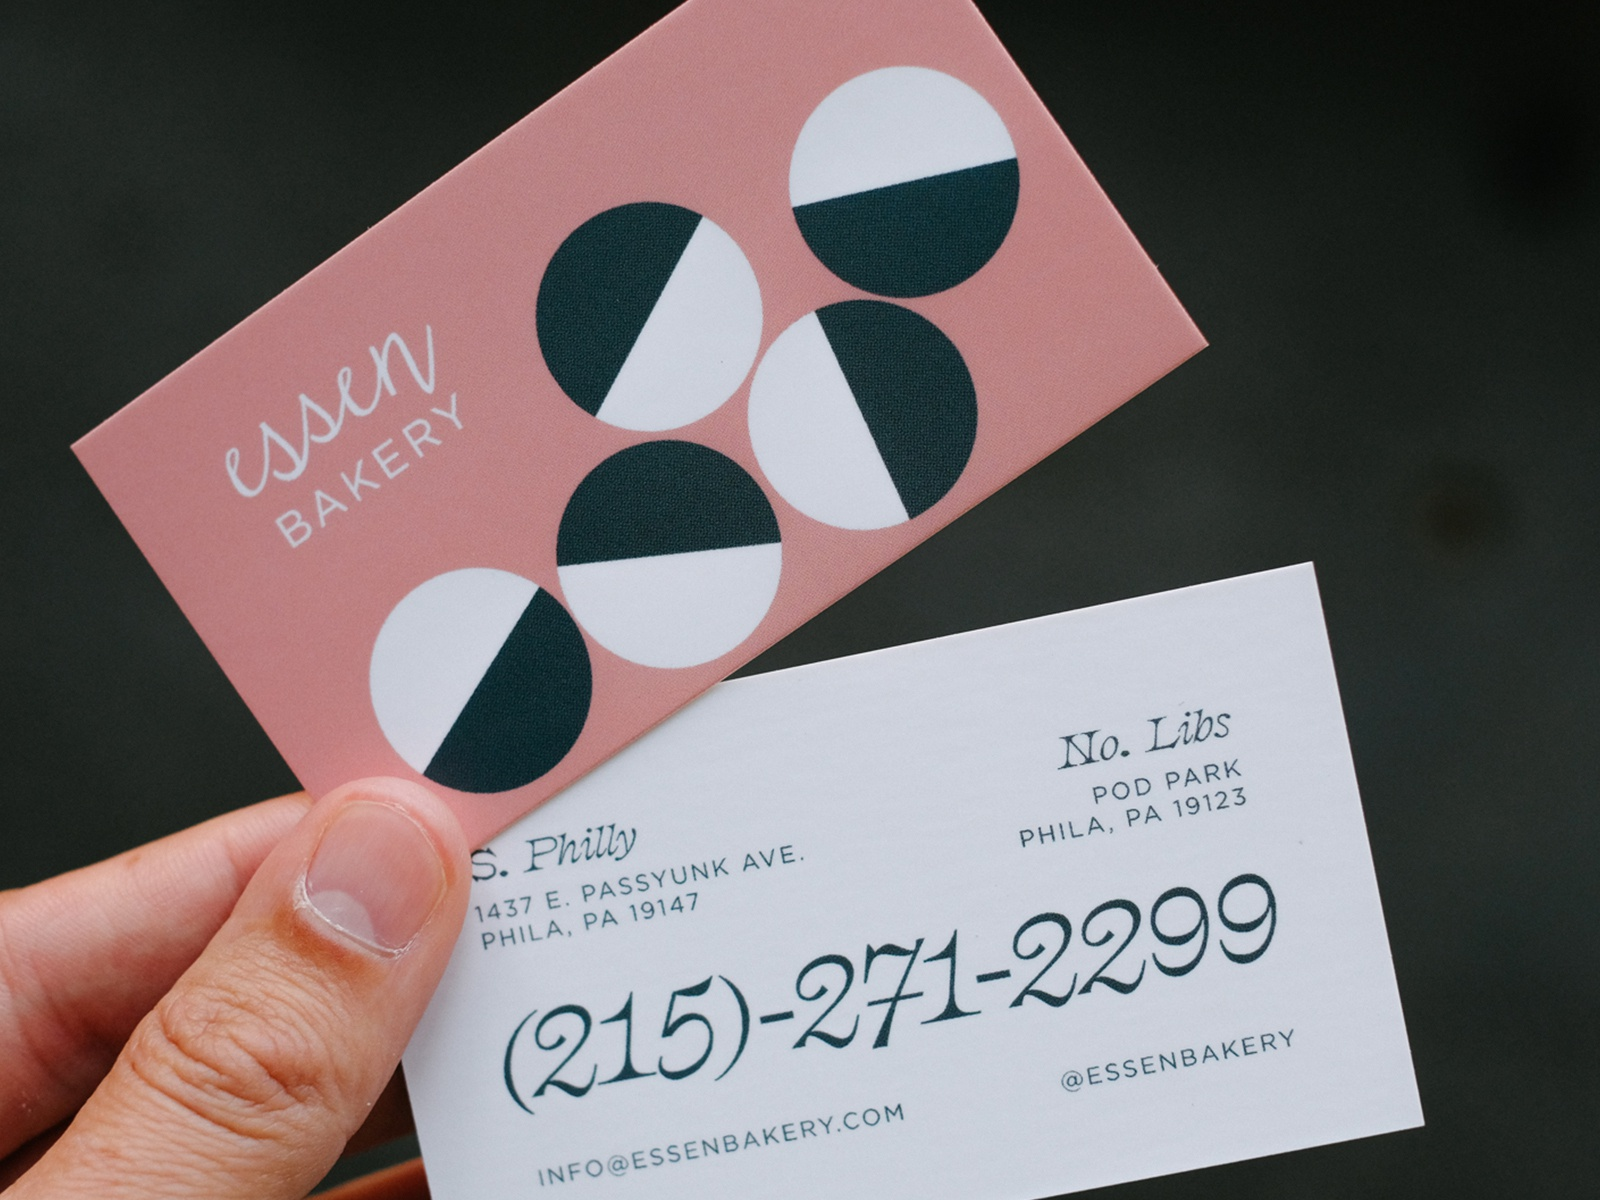 Essen business card dribbble